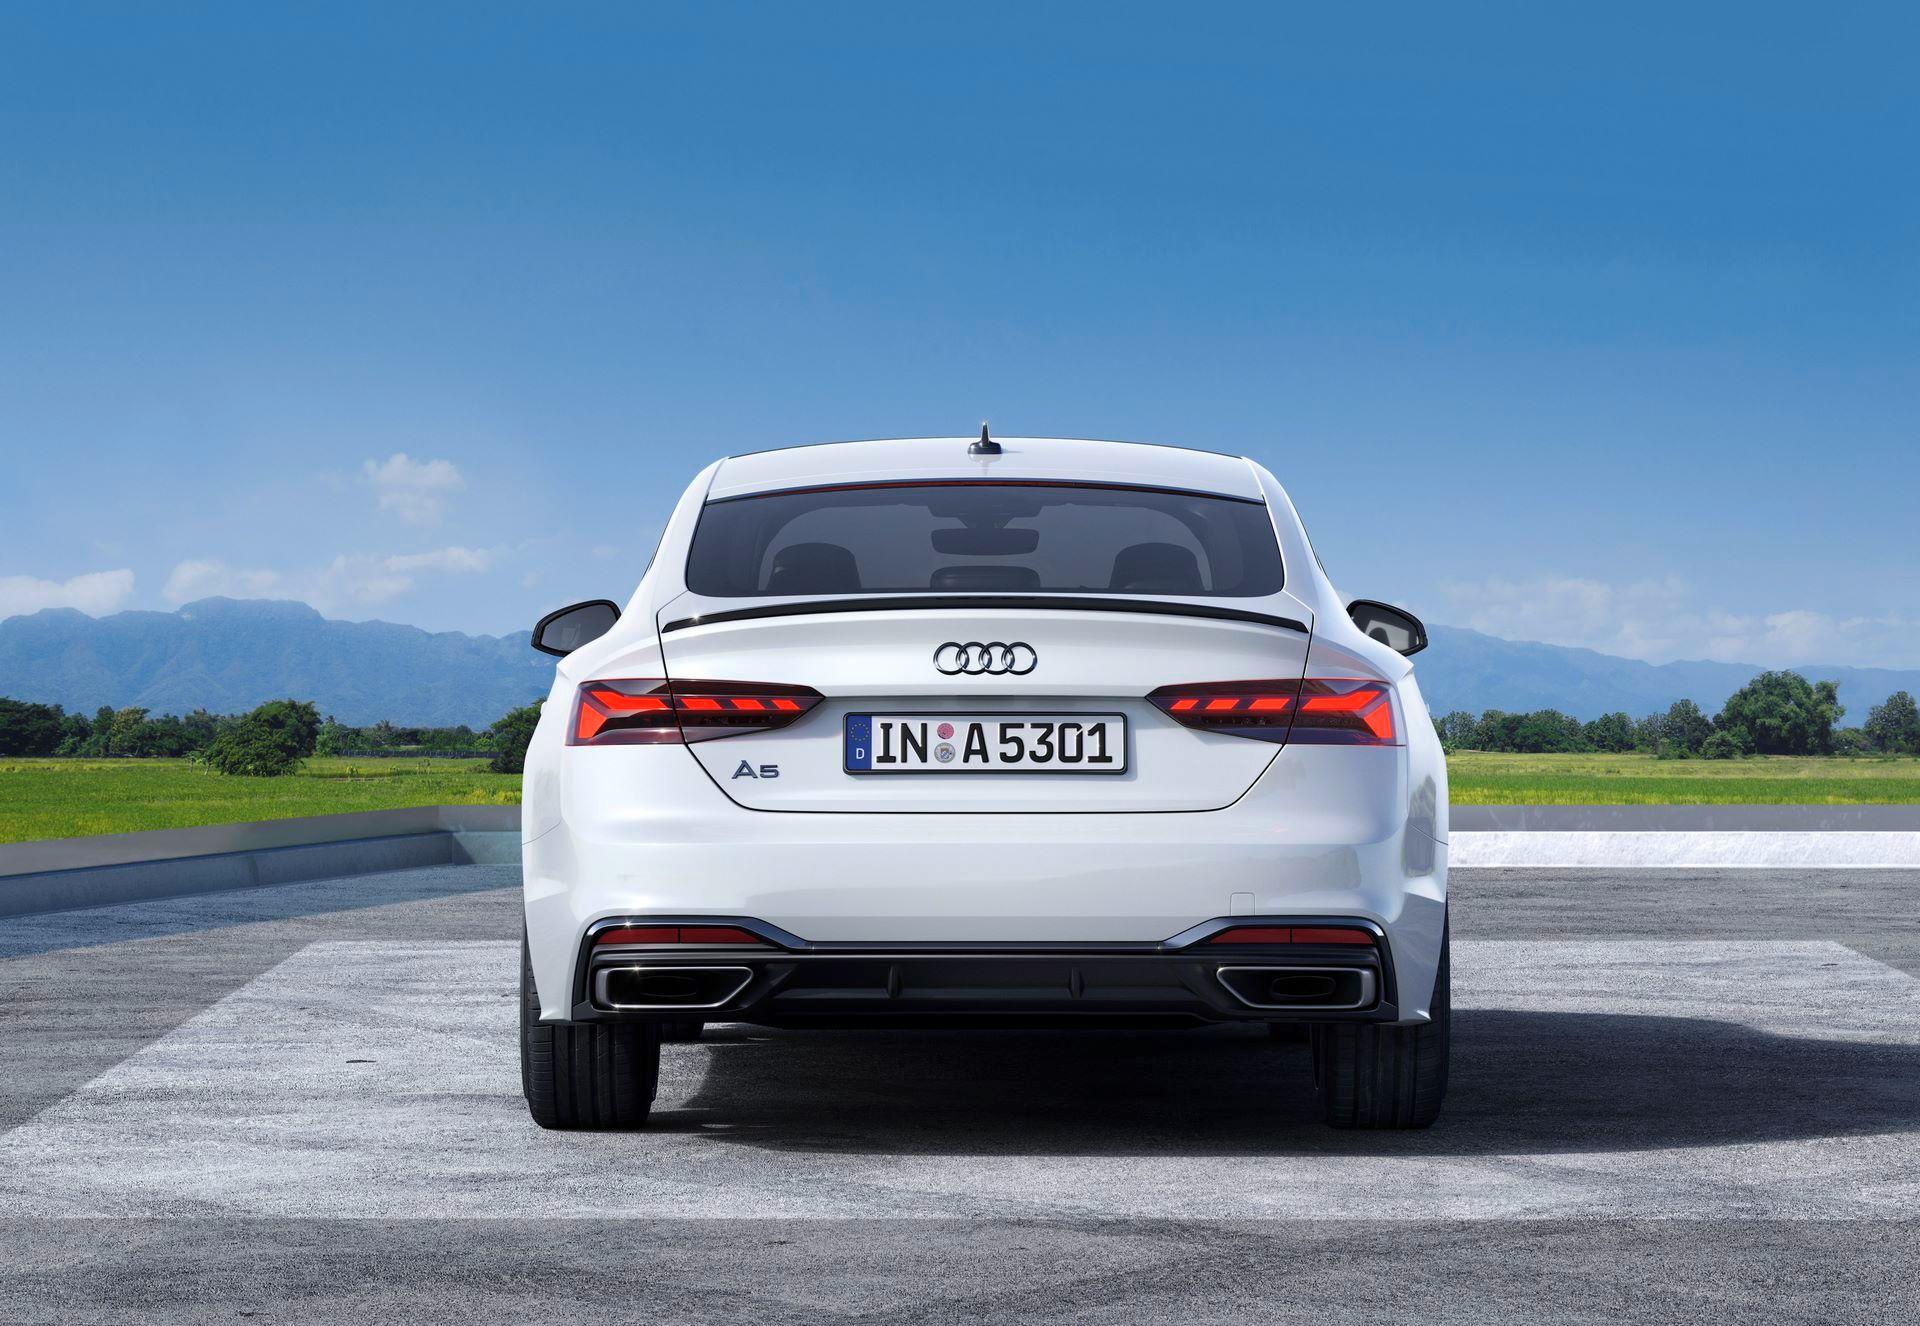 Audi-A4-A5-Q7-Q8-Competition-And-Competition-Plus-Trims-61